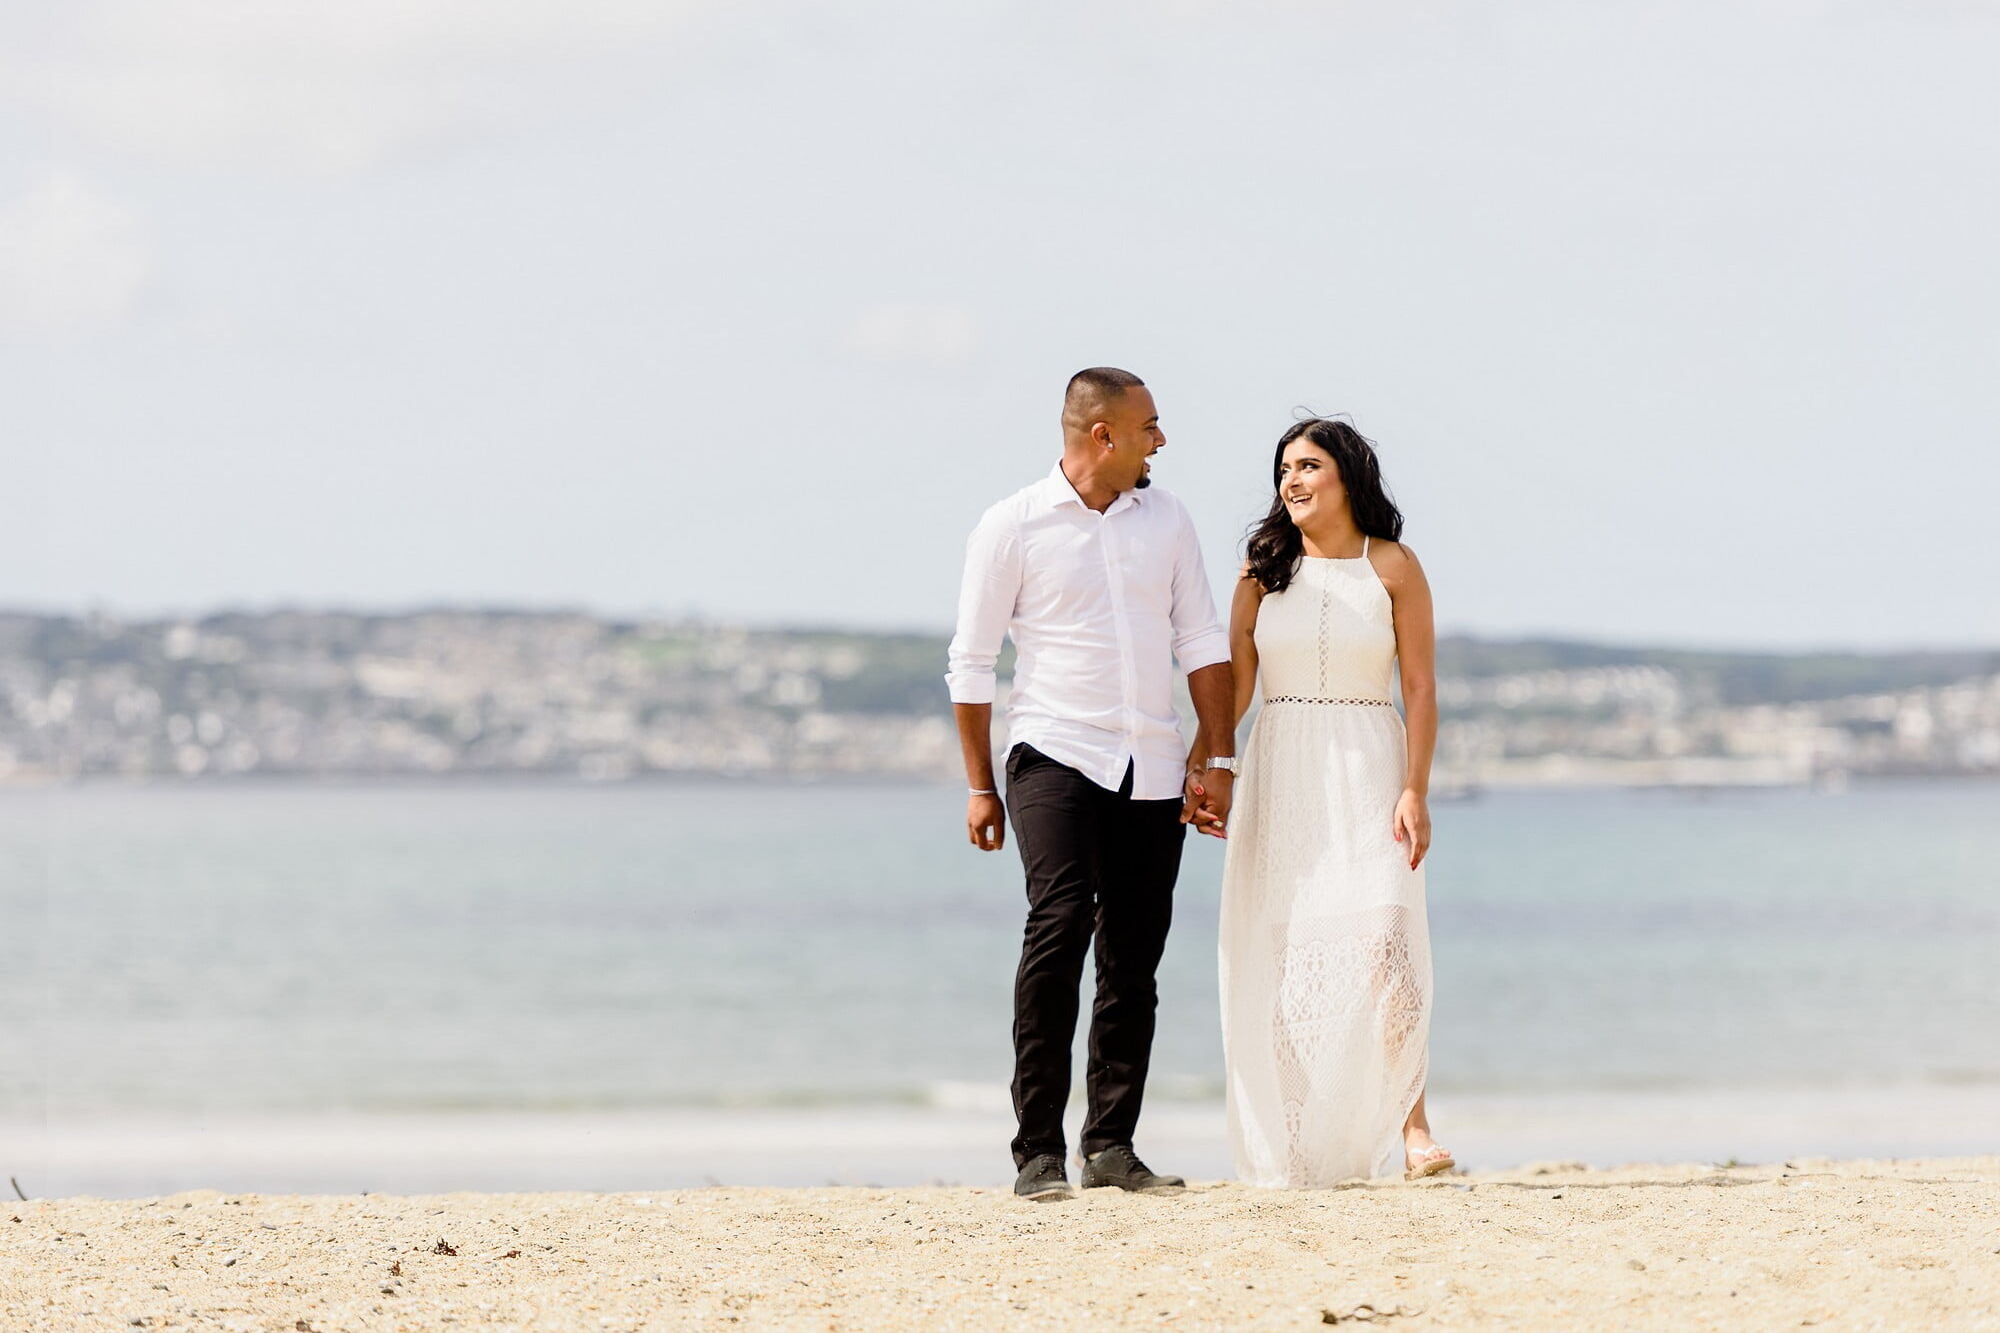 st-michaels-mount-wedding-proposal-3